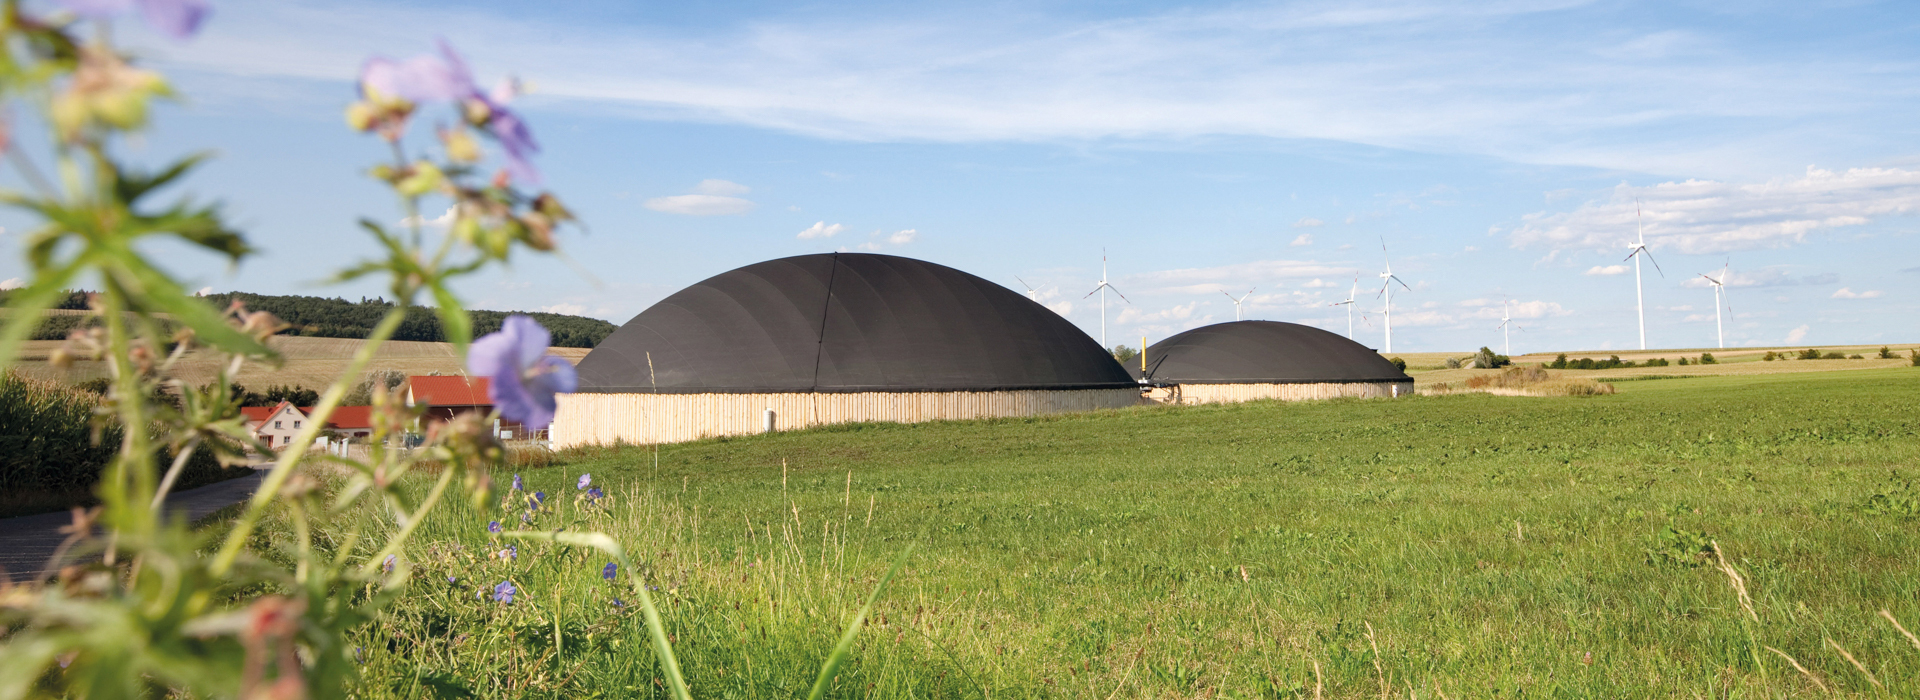 Farmers Happiness Biogasanlage